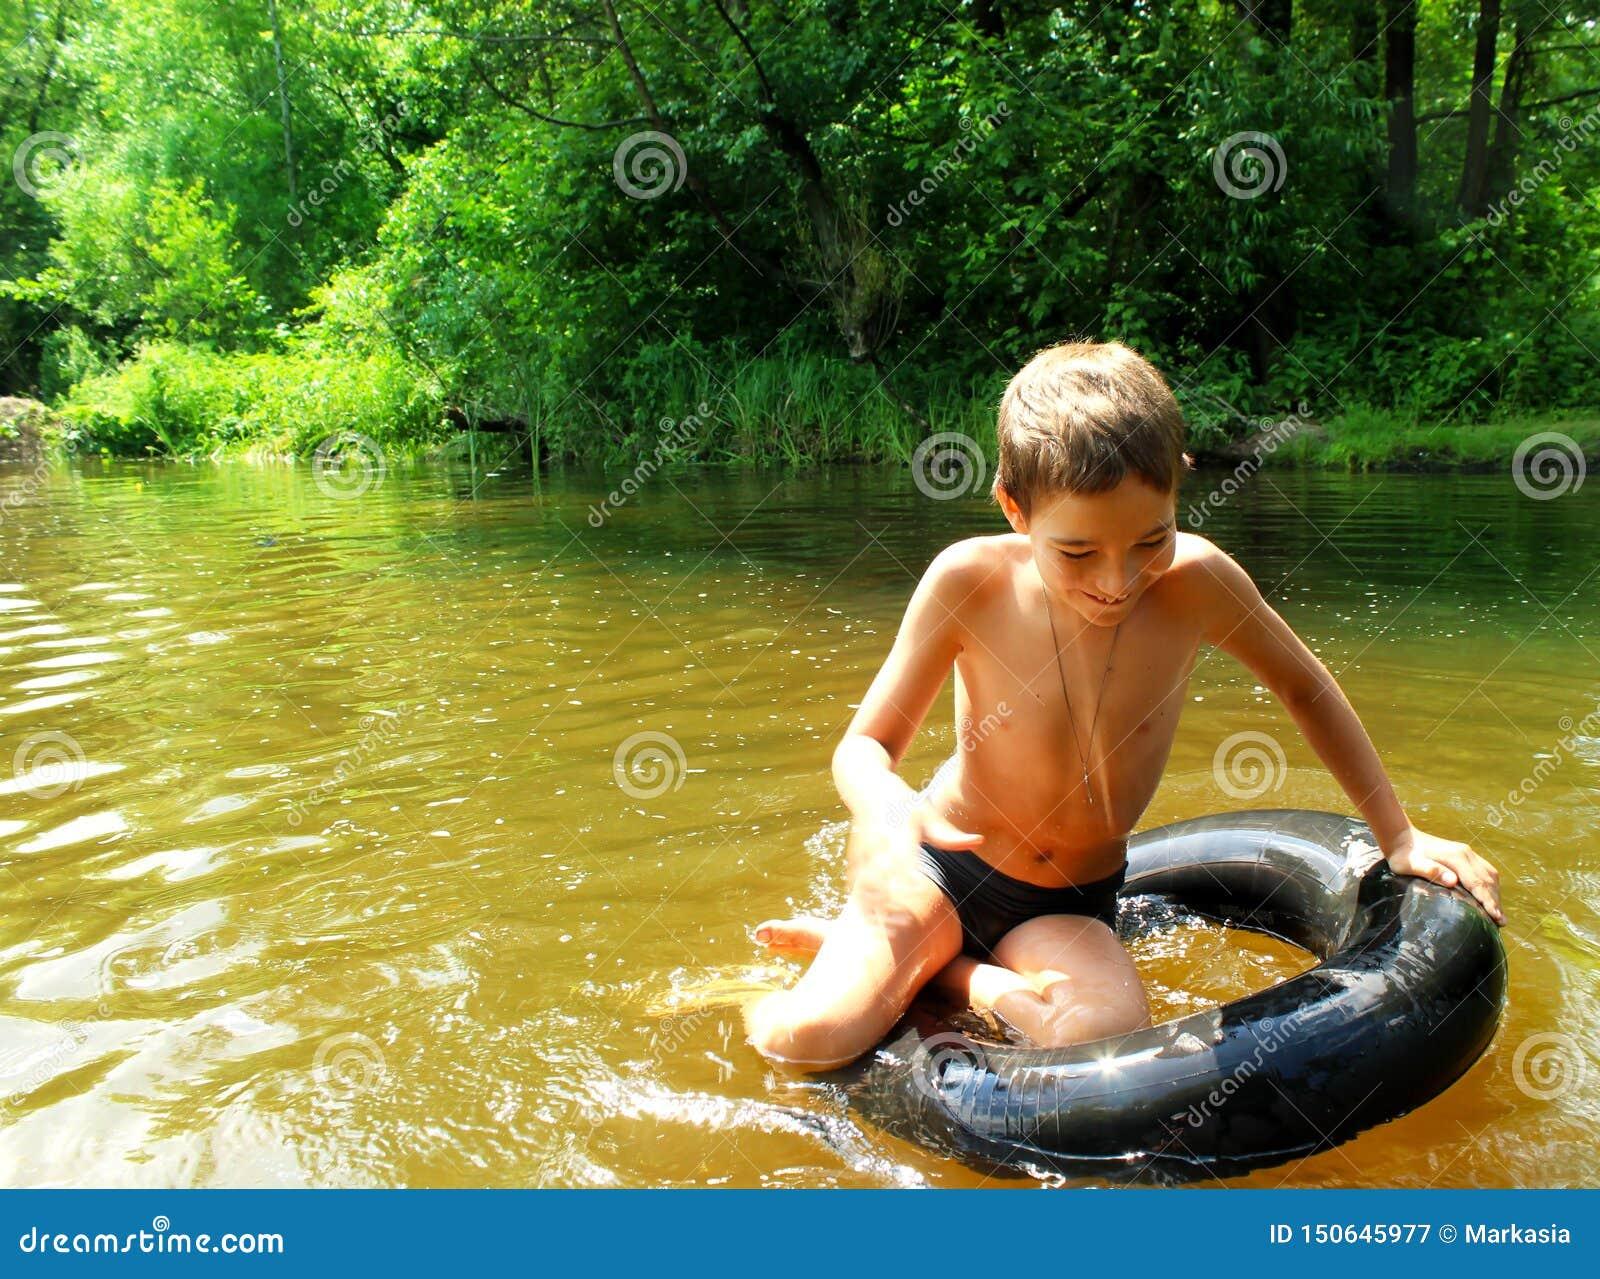 The boy has fun on an tubing in the river.